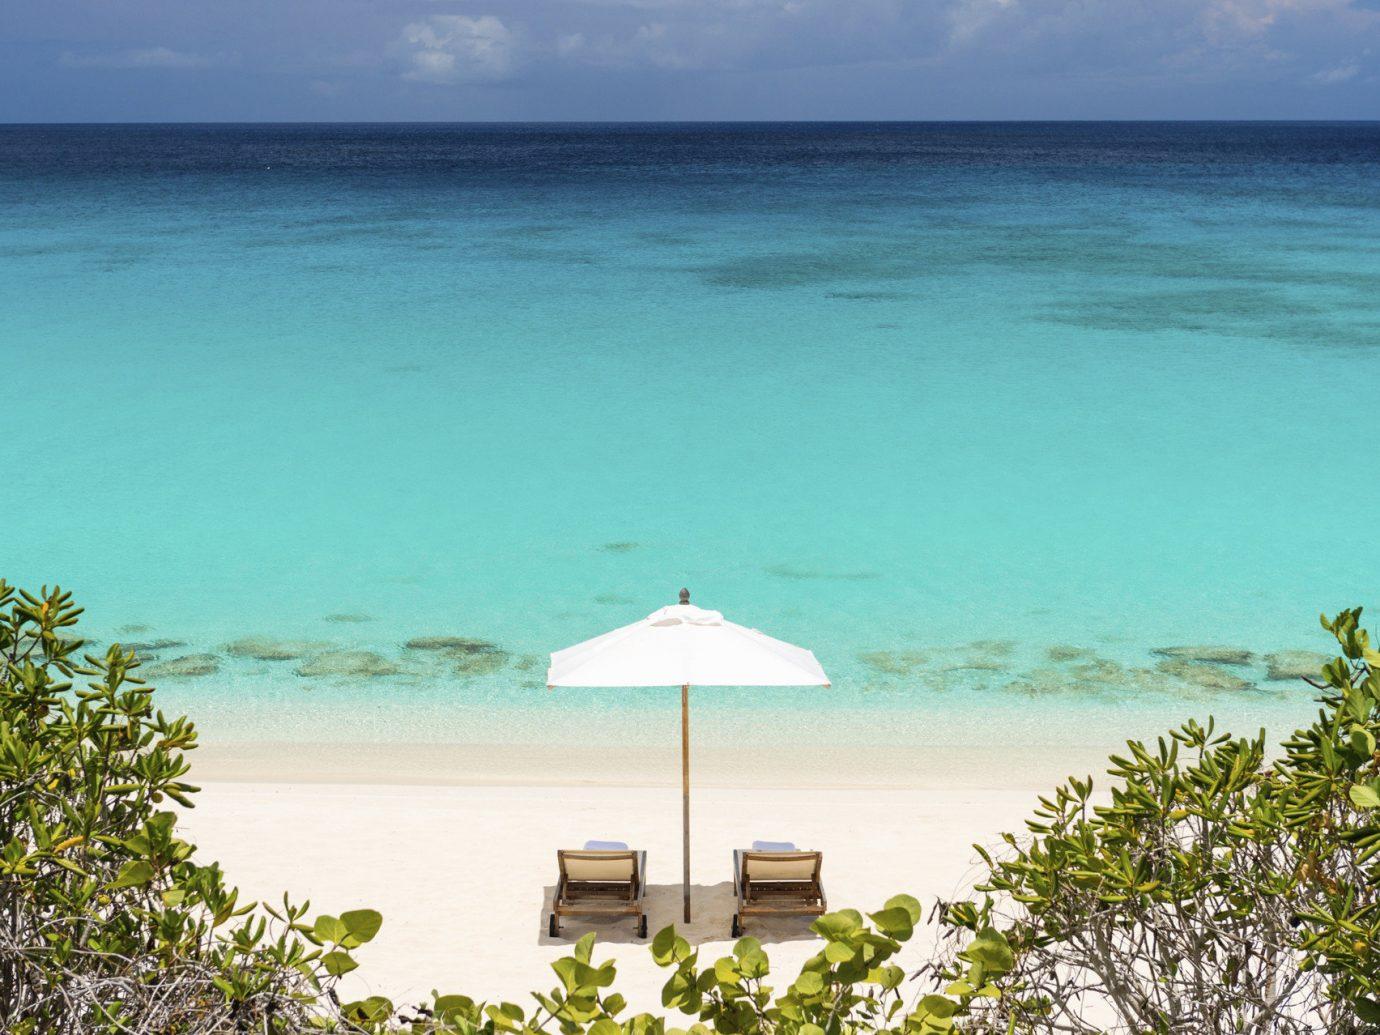 Hotels water sky outdoor Beach shore Sea Ocean body of water horizon caribbean vacation Coast Nature bay tropics sunlight cape Island Lagoon swimming sandy day